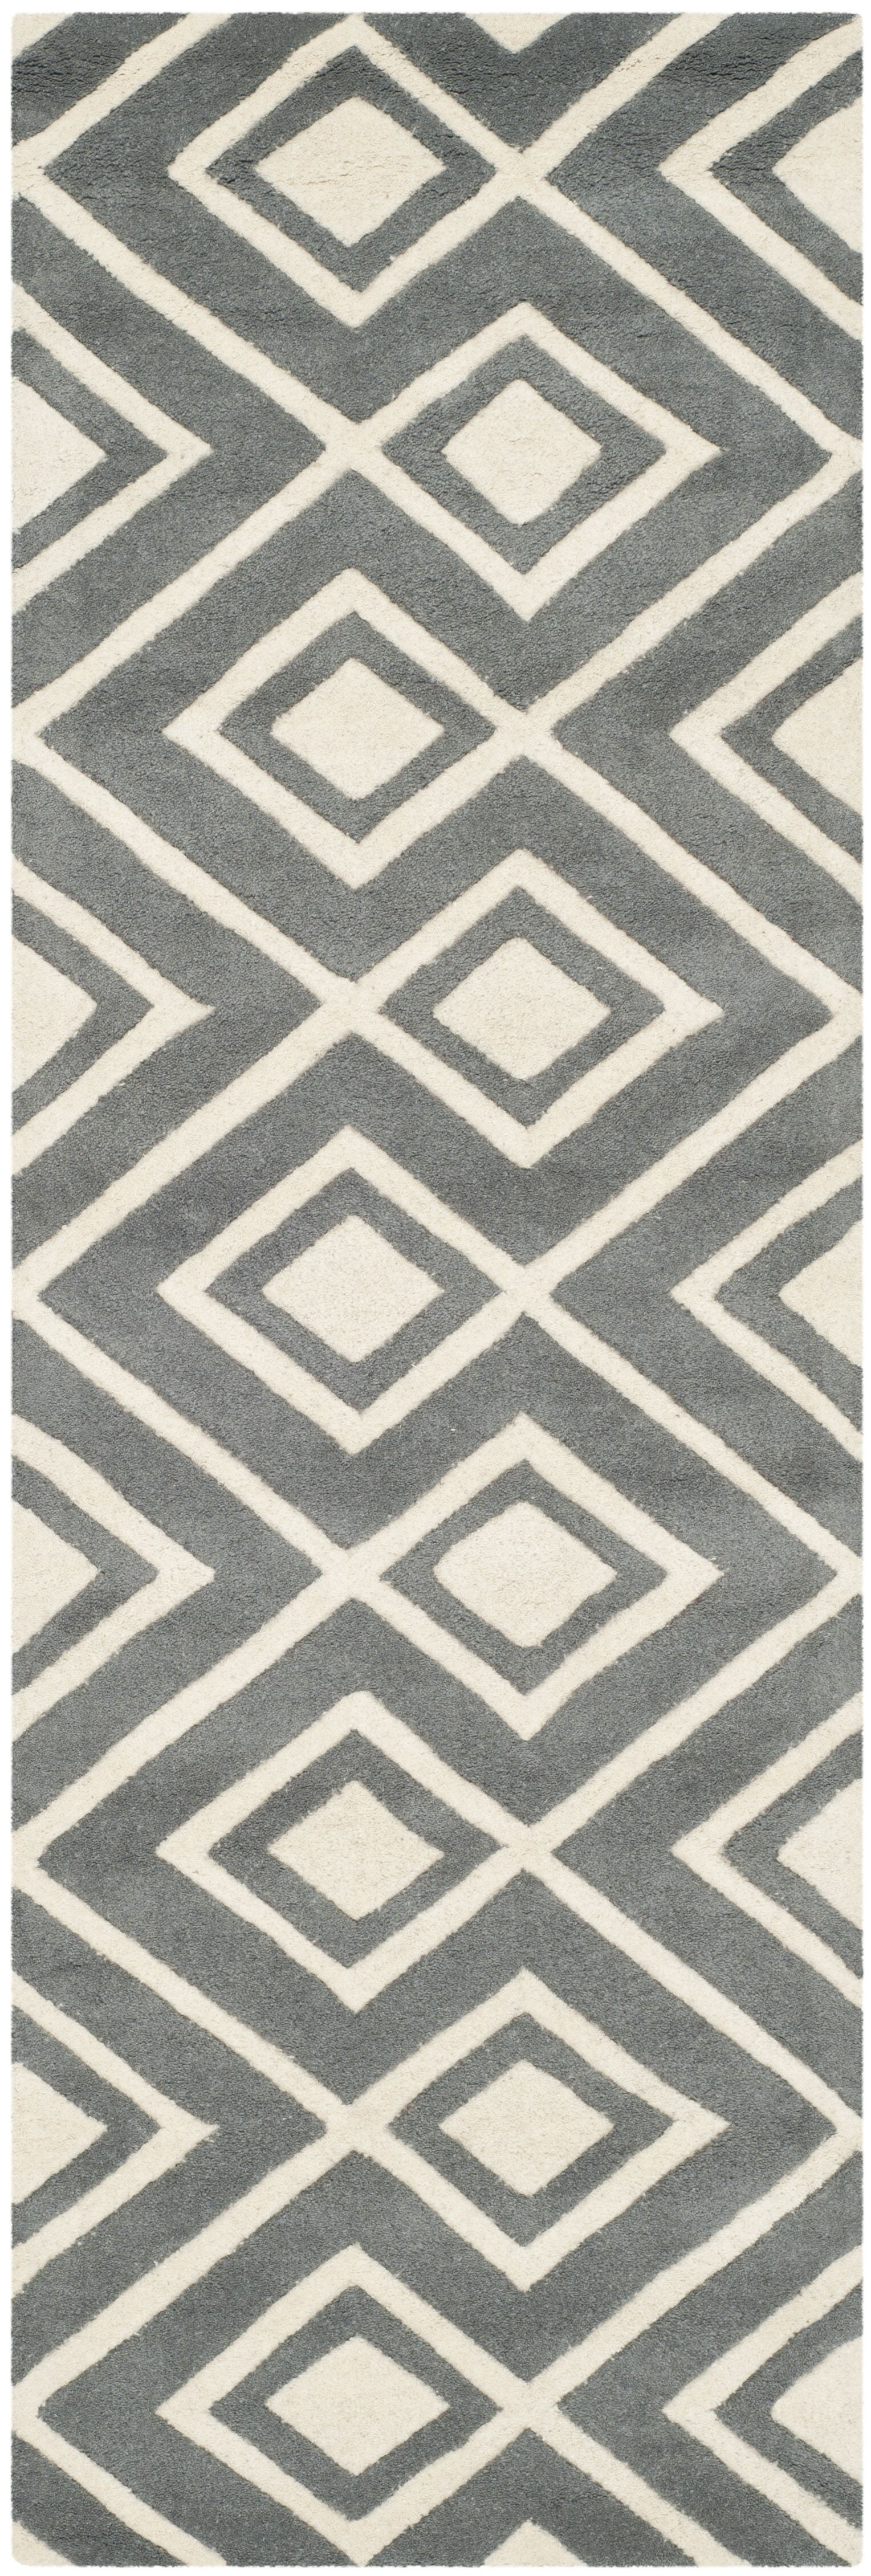 Wilkin Hand-Tufted Wool Dark Gray/Ivory Area Rug Rug Size: Runner 2'3